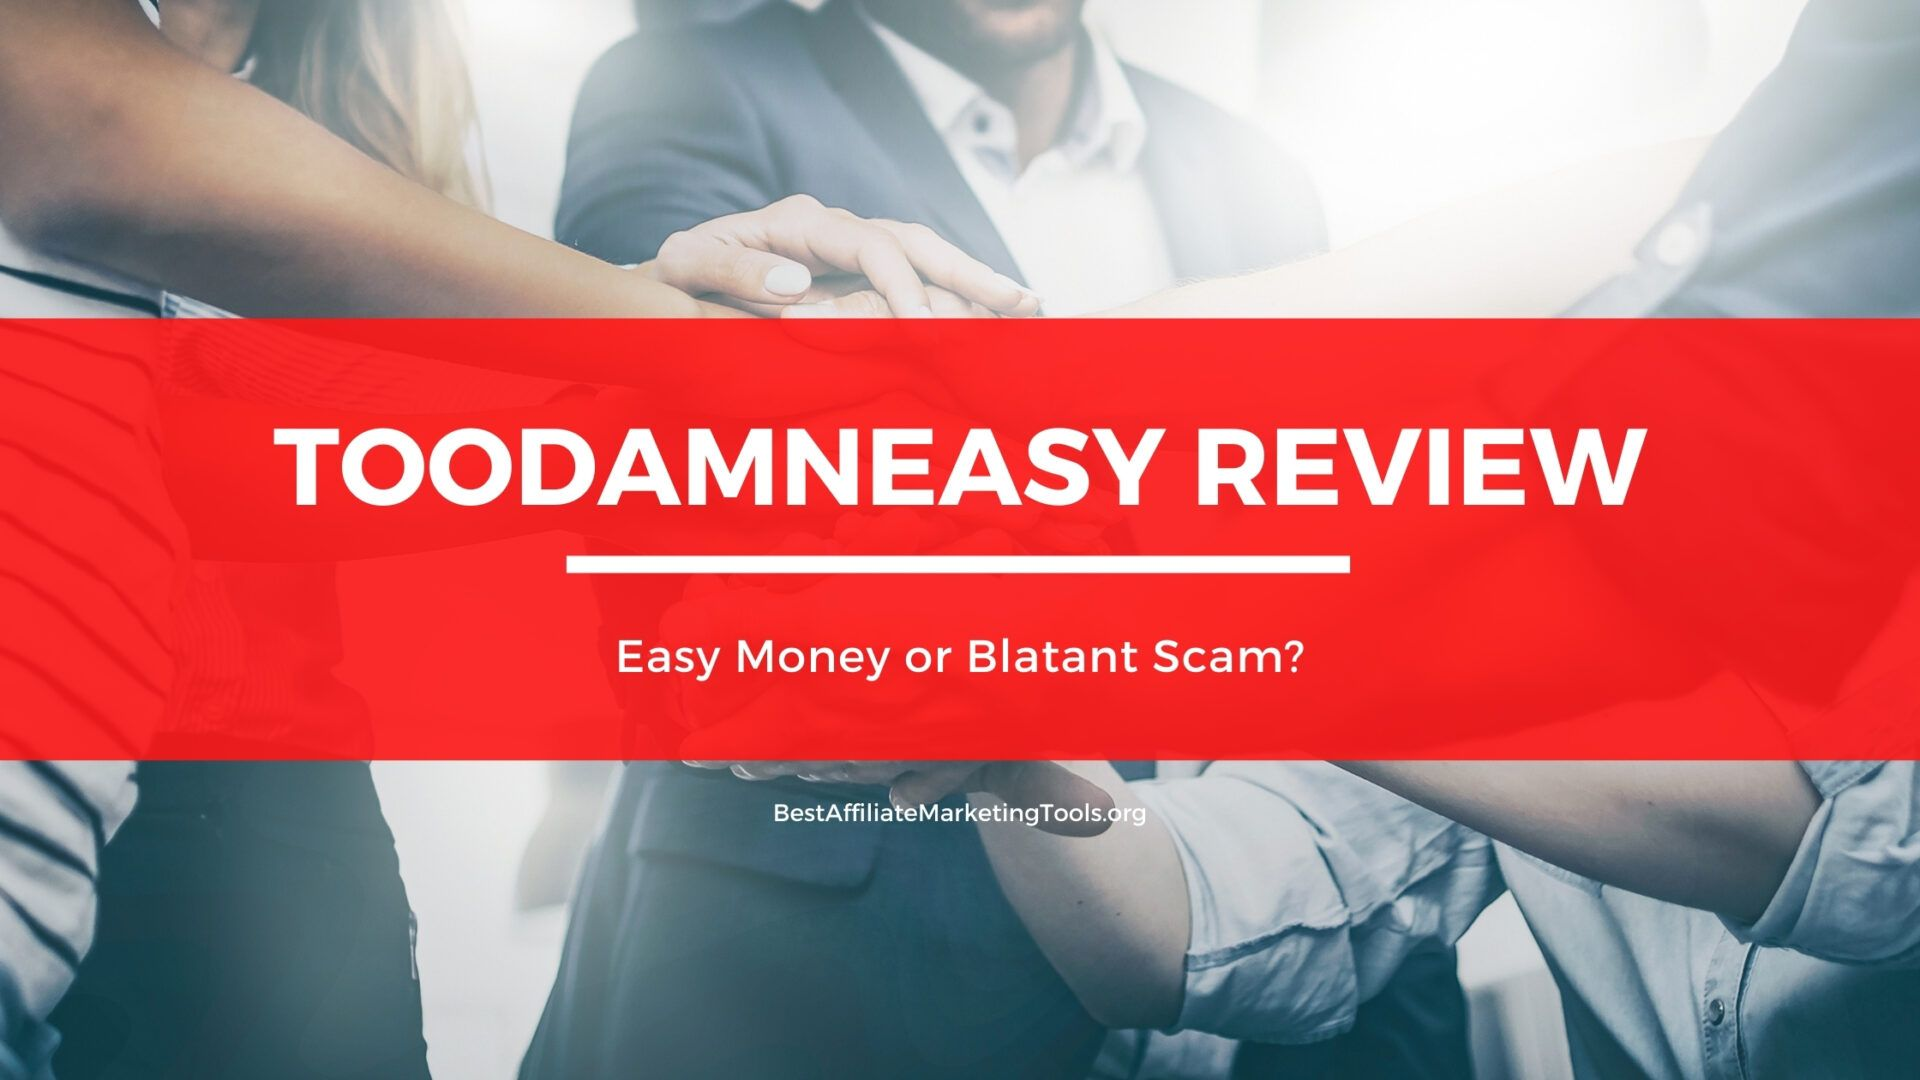 TooDamnEasy Review